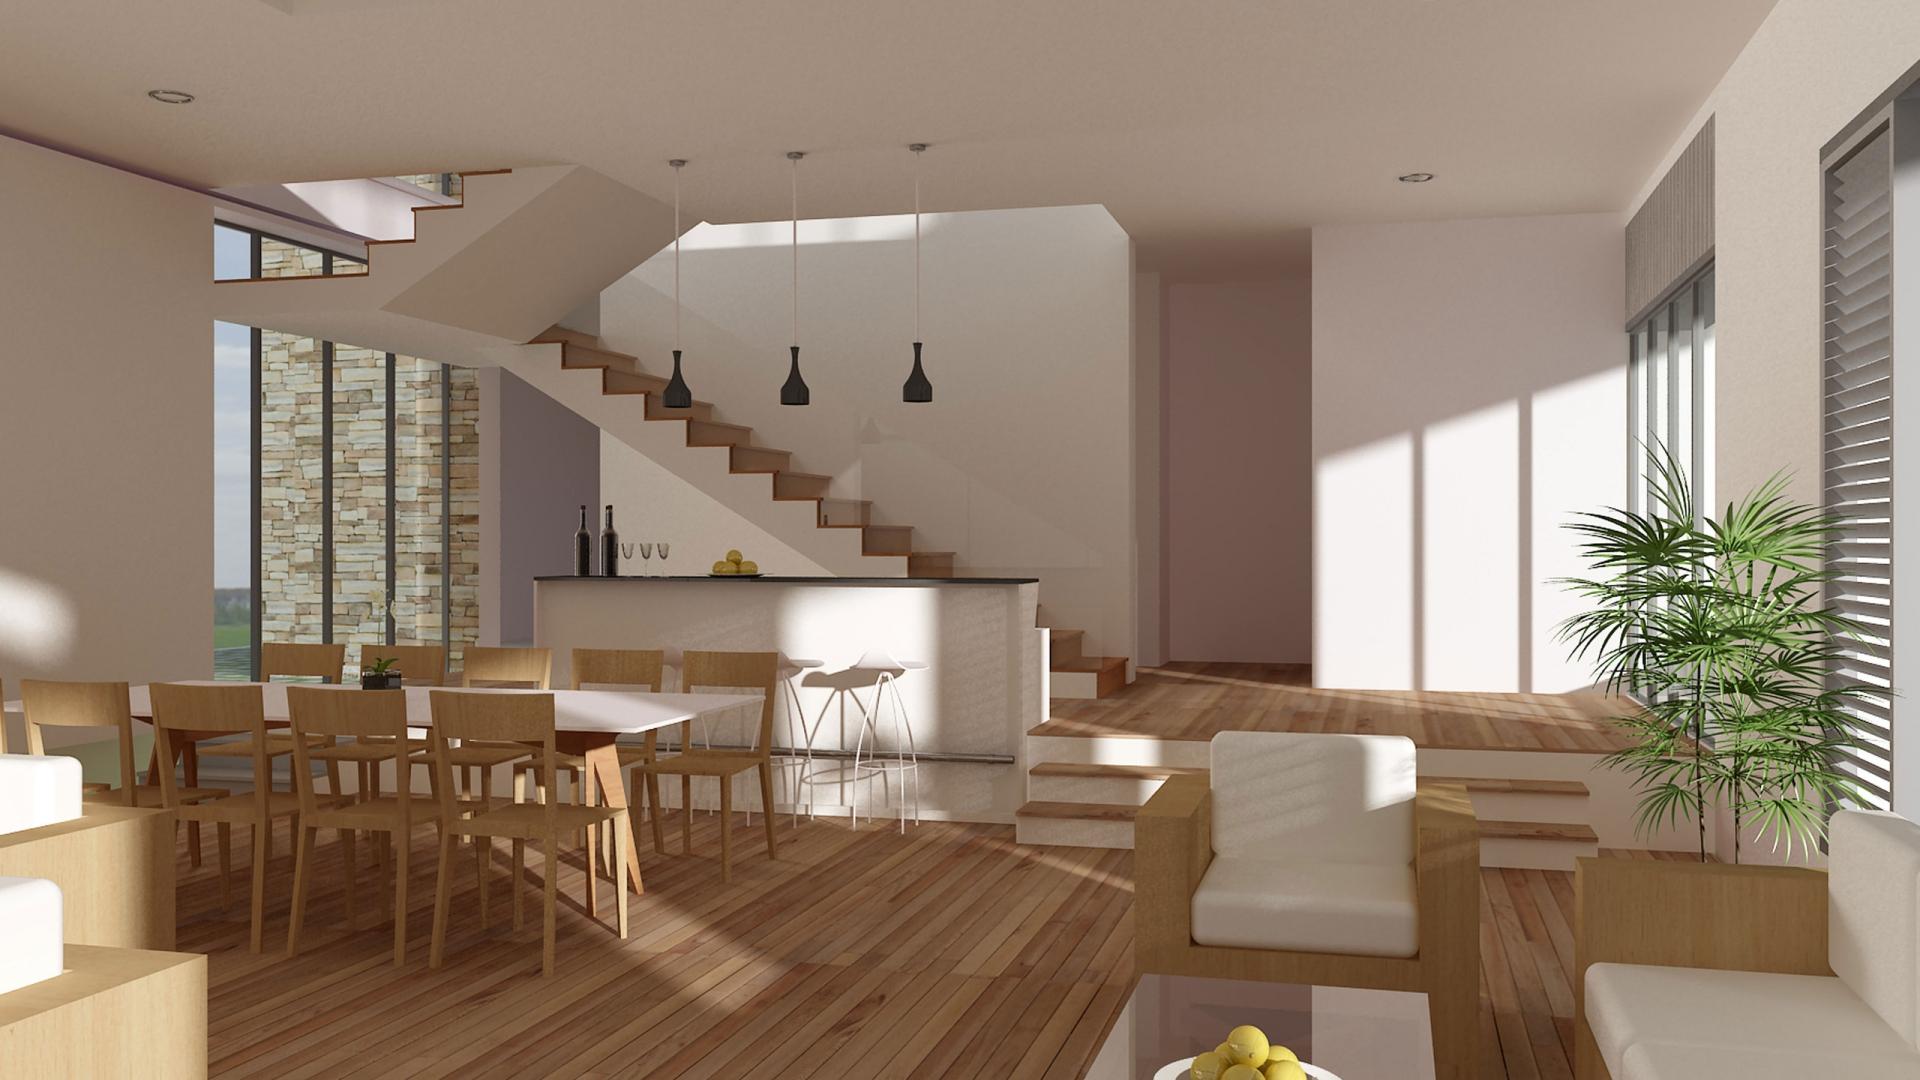 Modern Interieur Warm : Warm and modern interior design mystery wallpaper